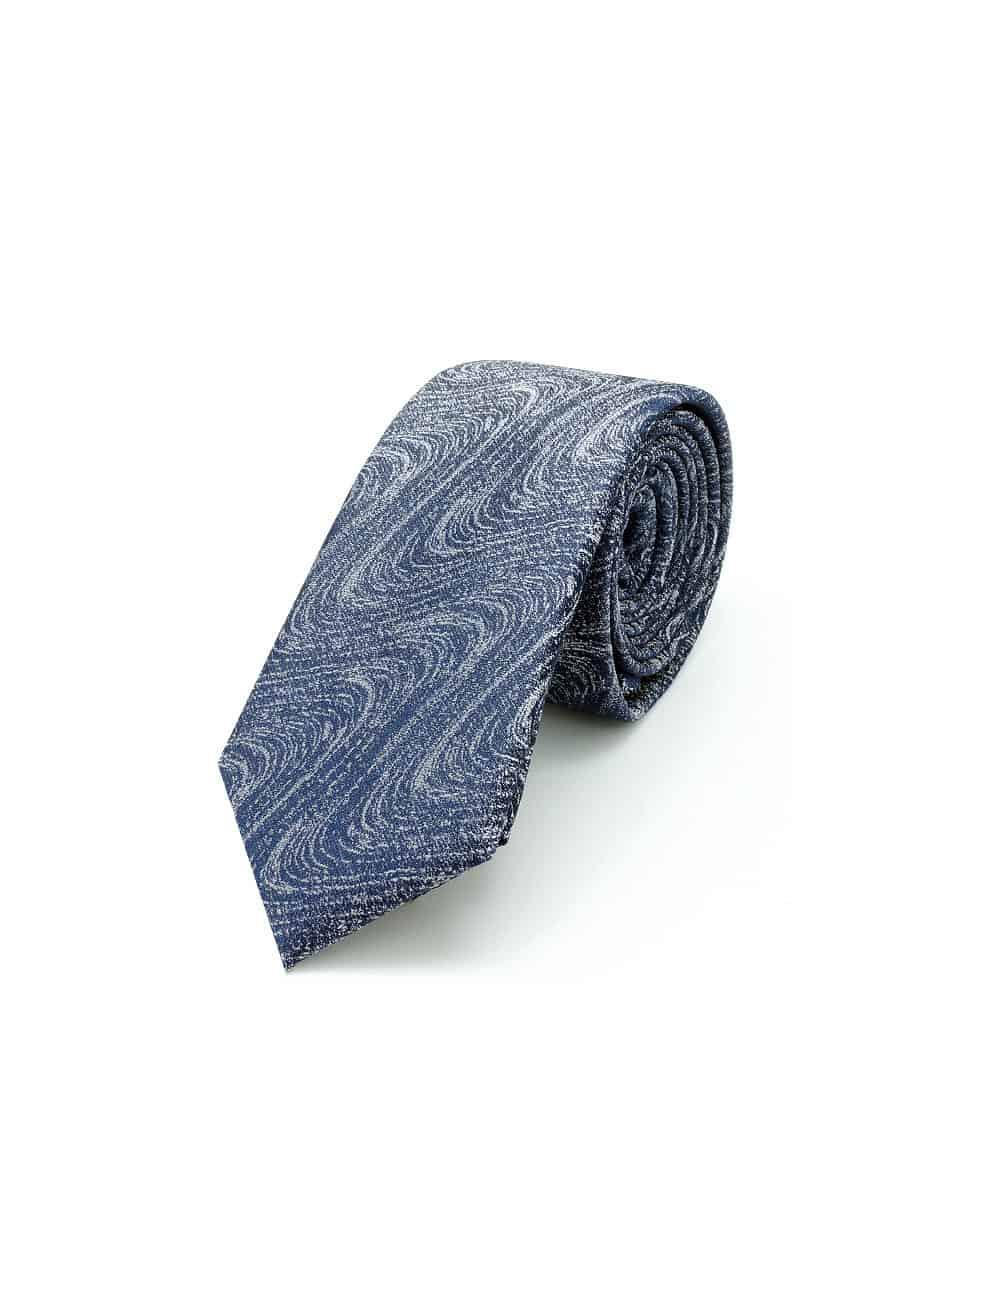 Grey Dobby Spill Resist Woven Necktie NT38.9